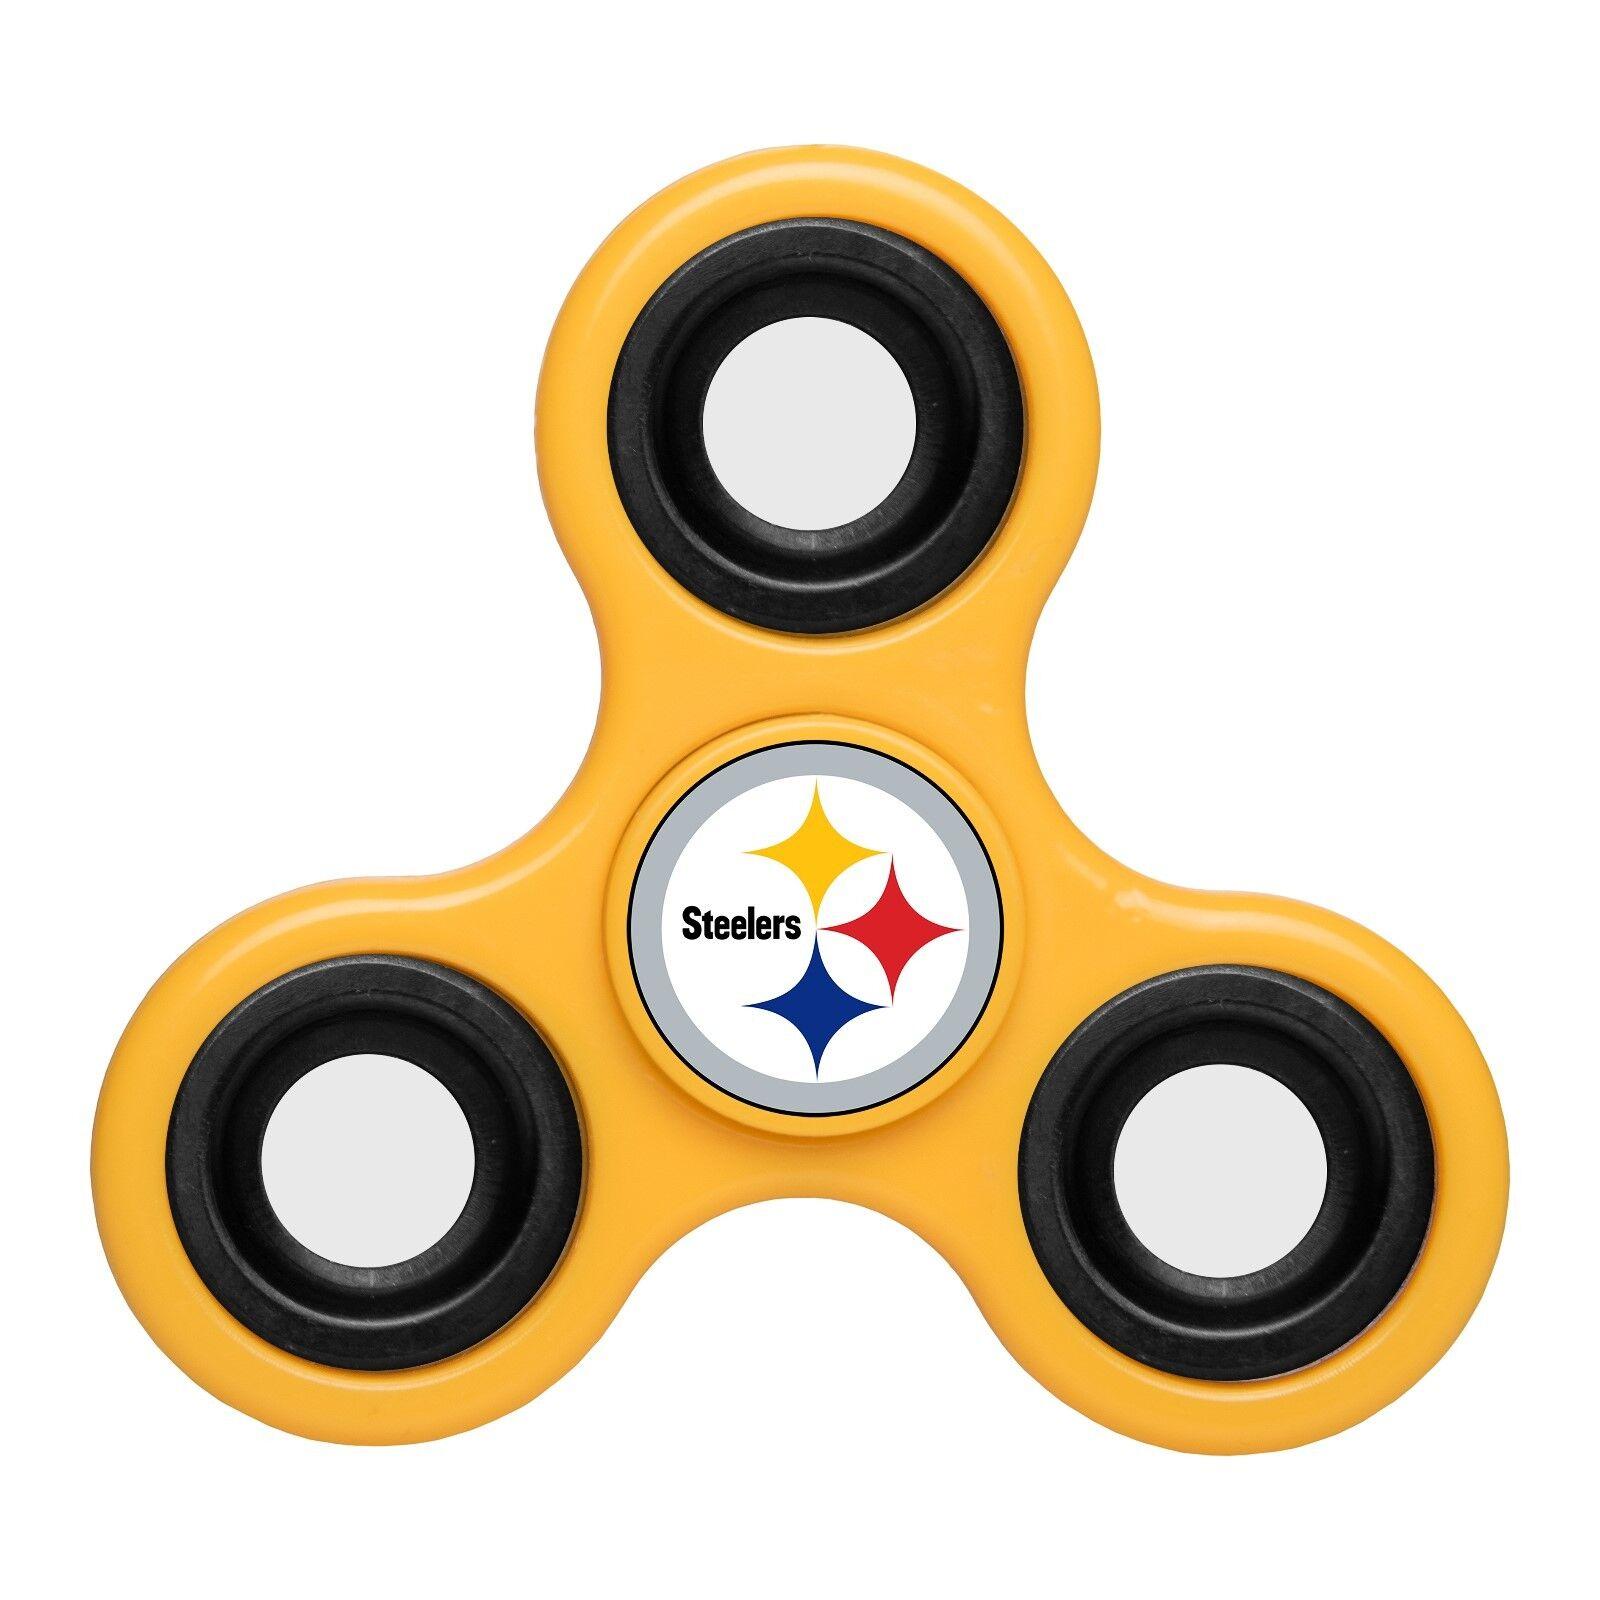 NFL Team Logo 3 Three Way Diztracto Fidget Hand Spinners - Pick Team - IN STOCK